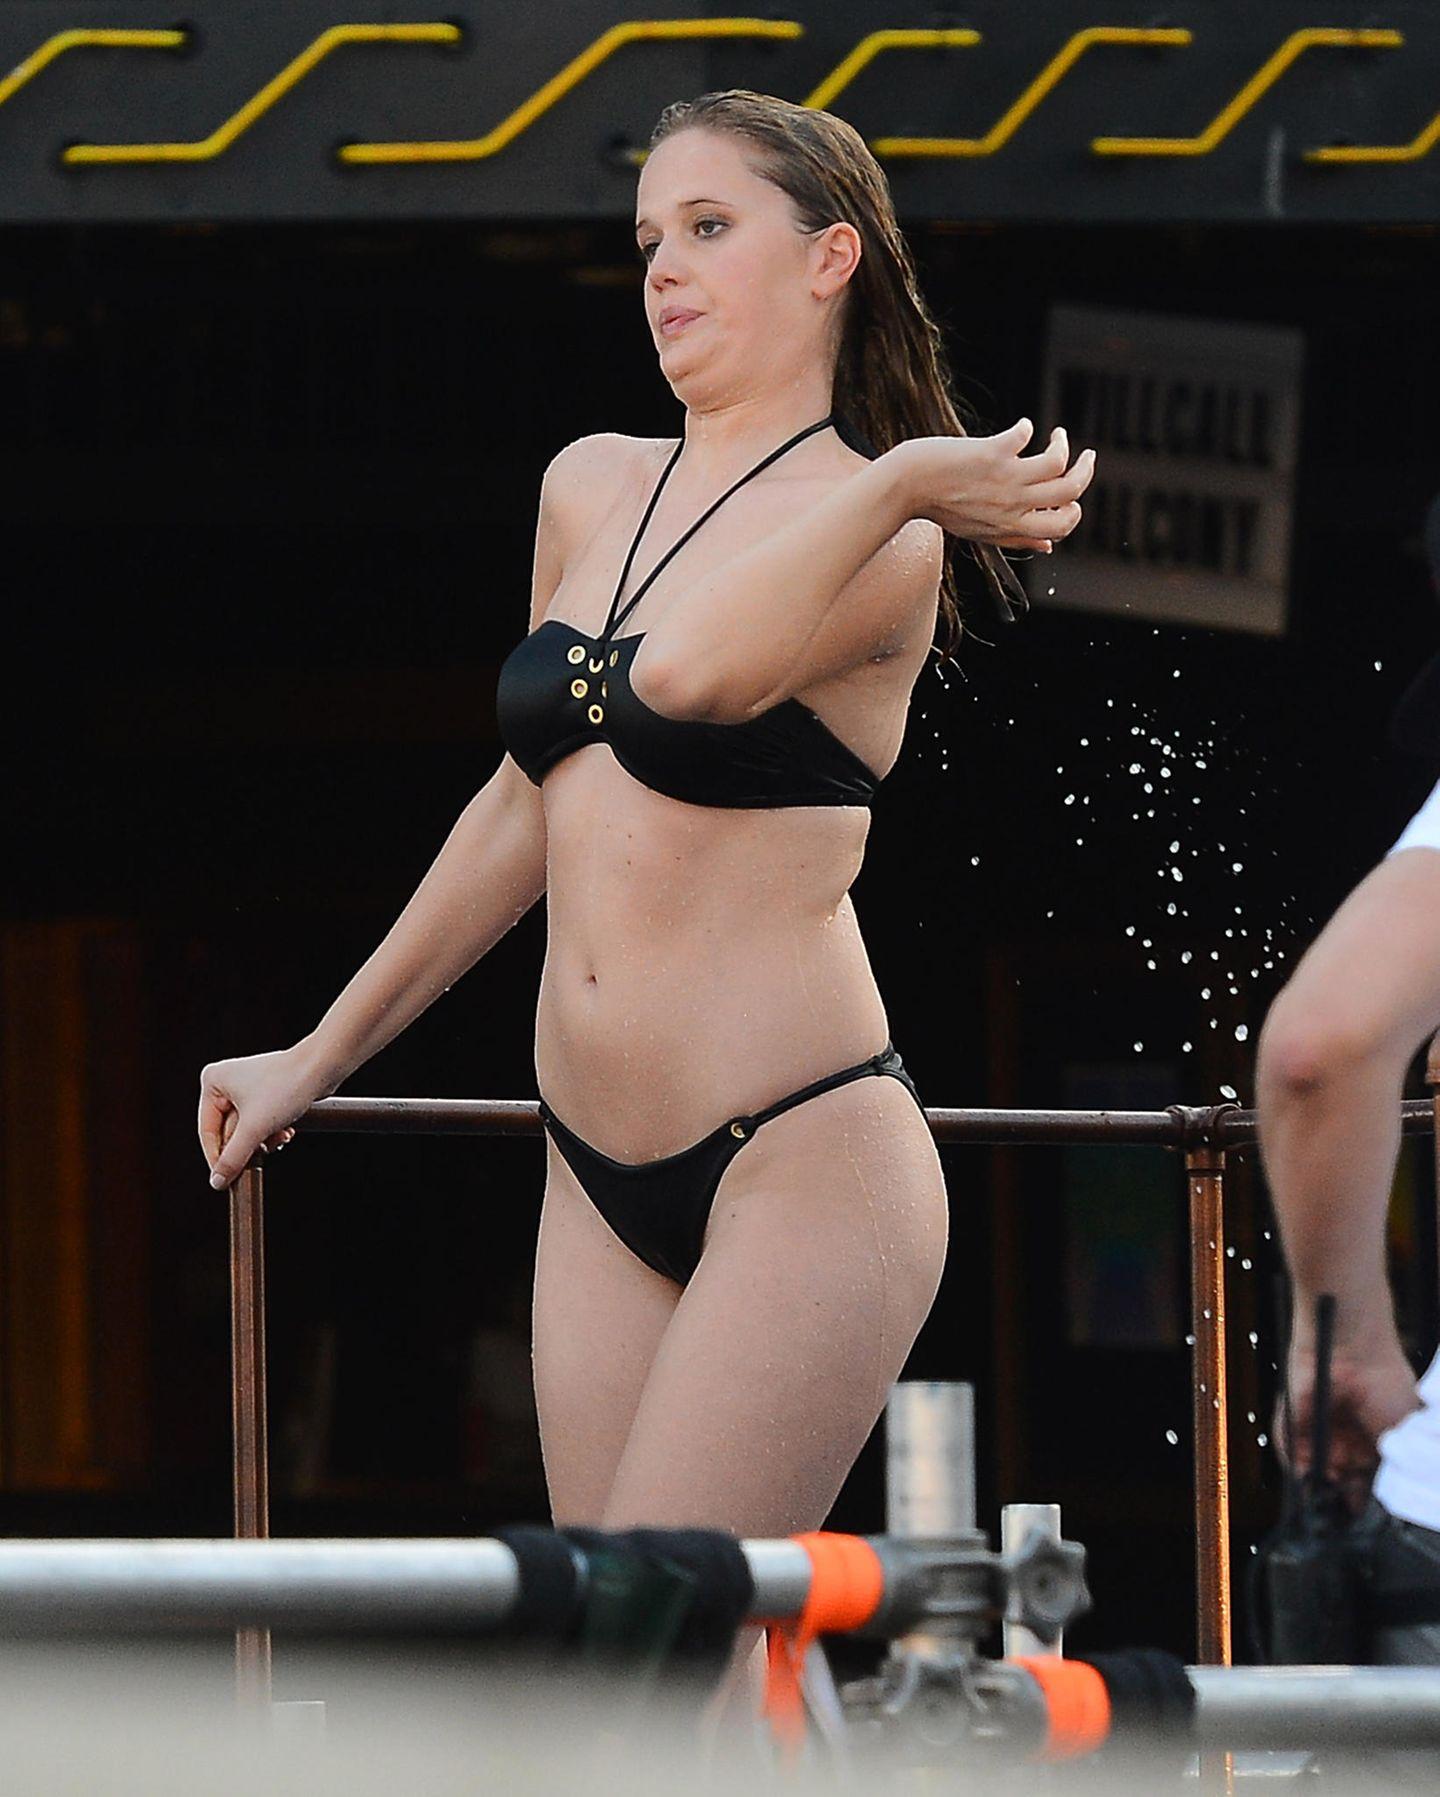 Gntm Bikini Shooting